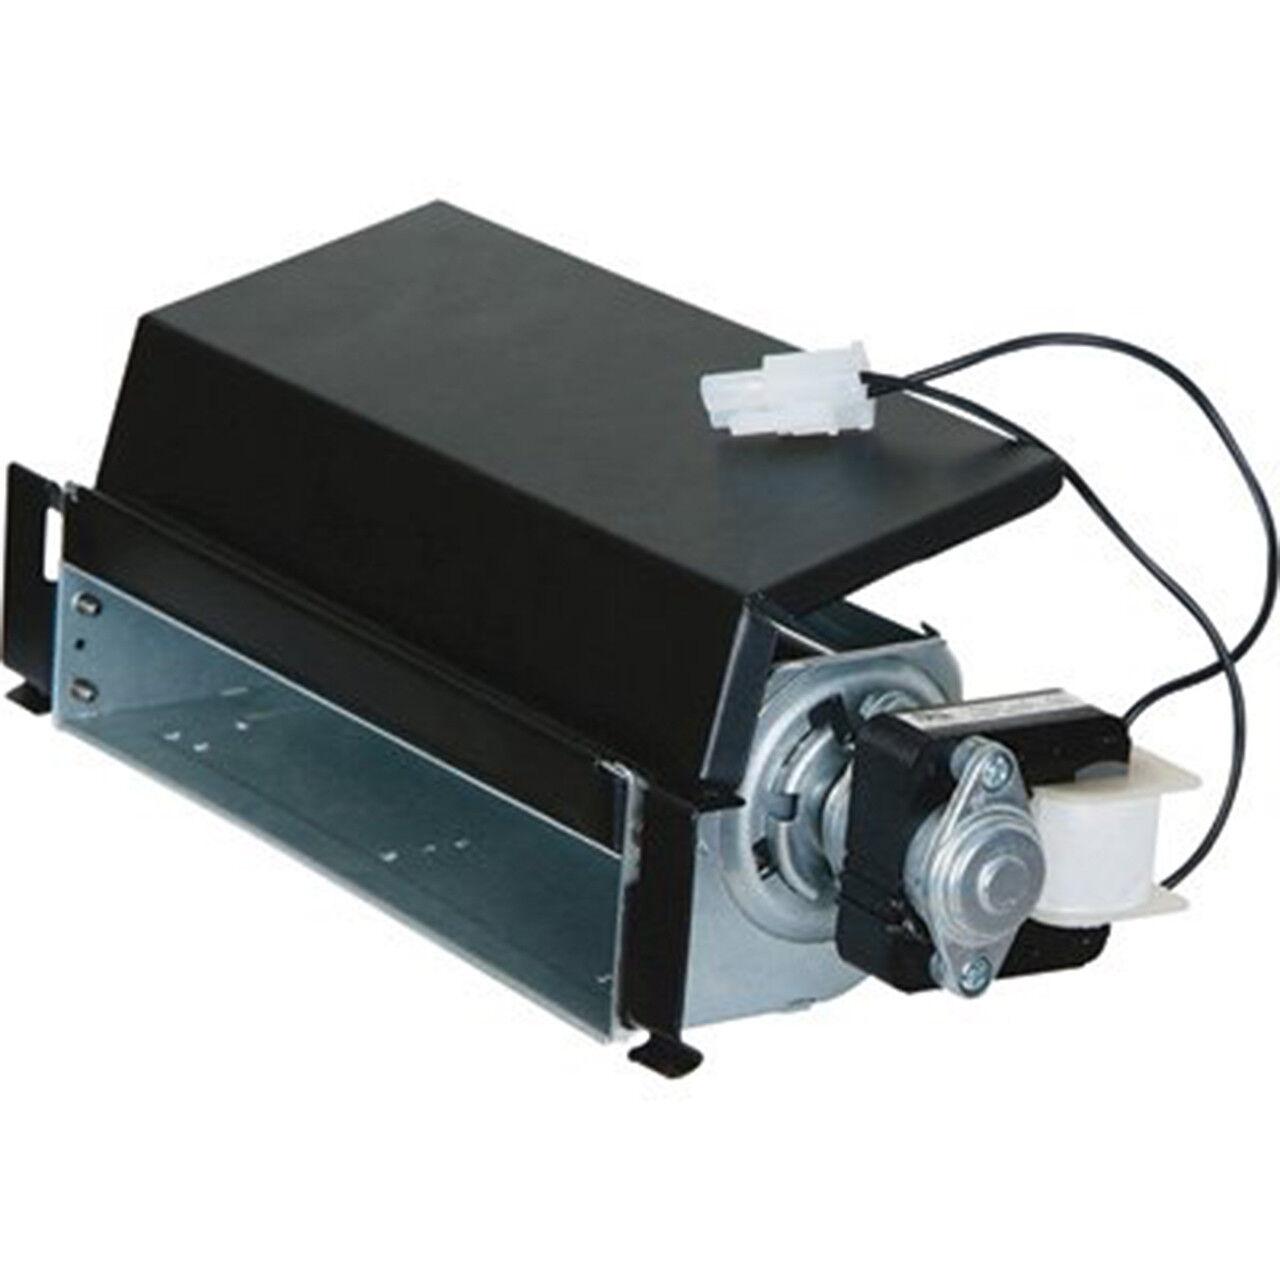 ProCom FIB100 Dual Fuel Fireplace Blower, Large, Black, Silv